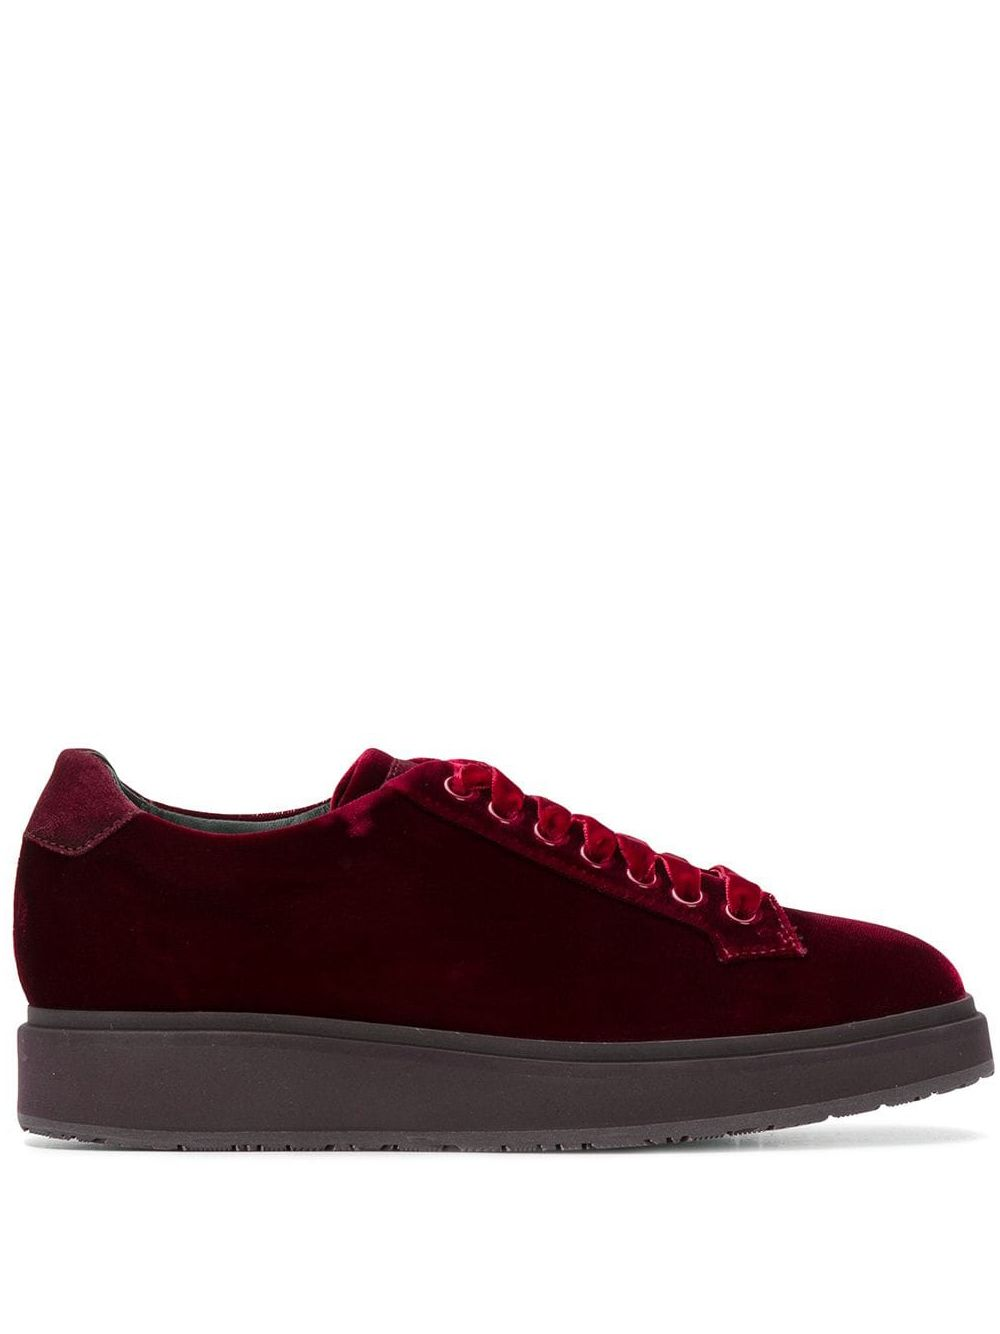 Santoni | кроссовки на шнуровке | Clouty